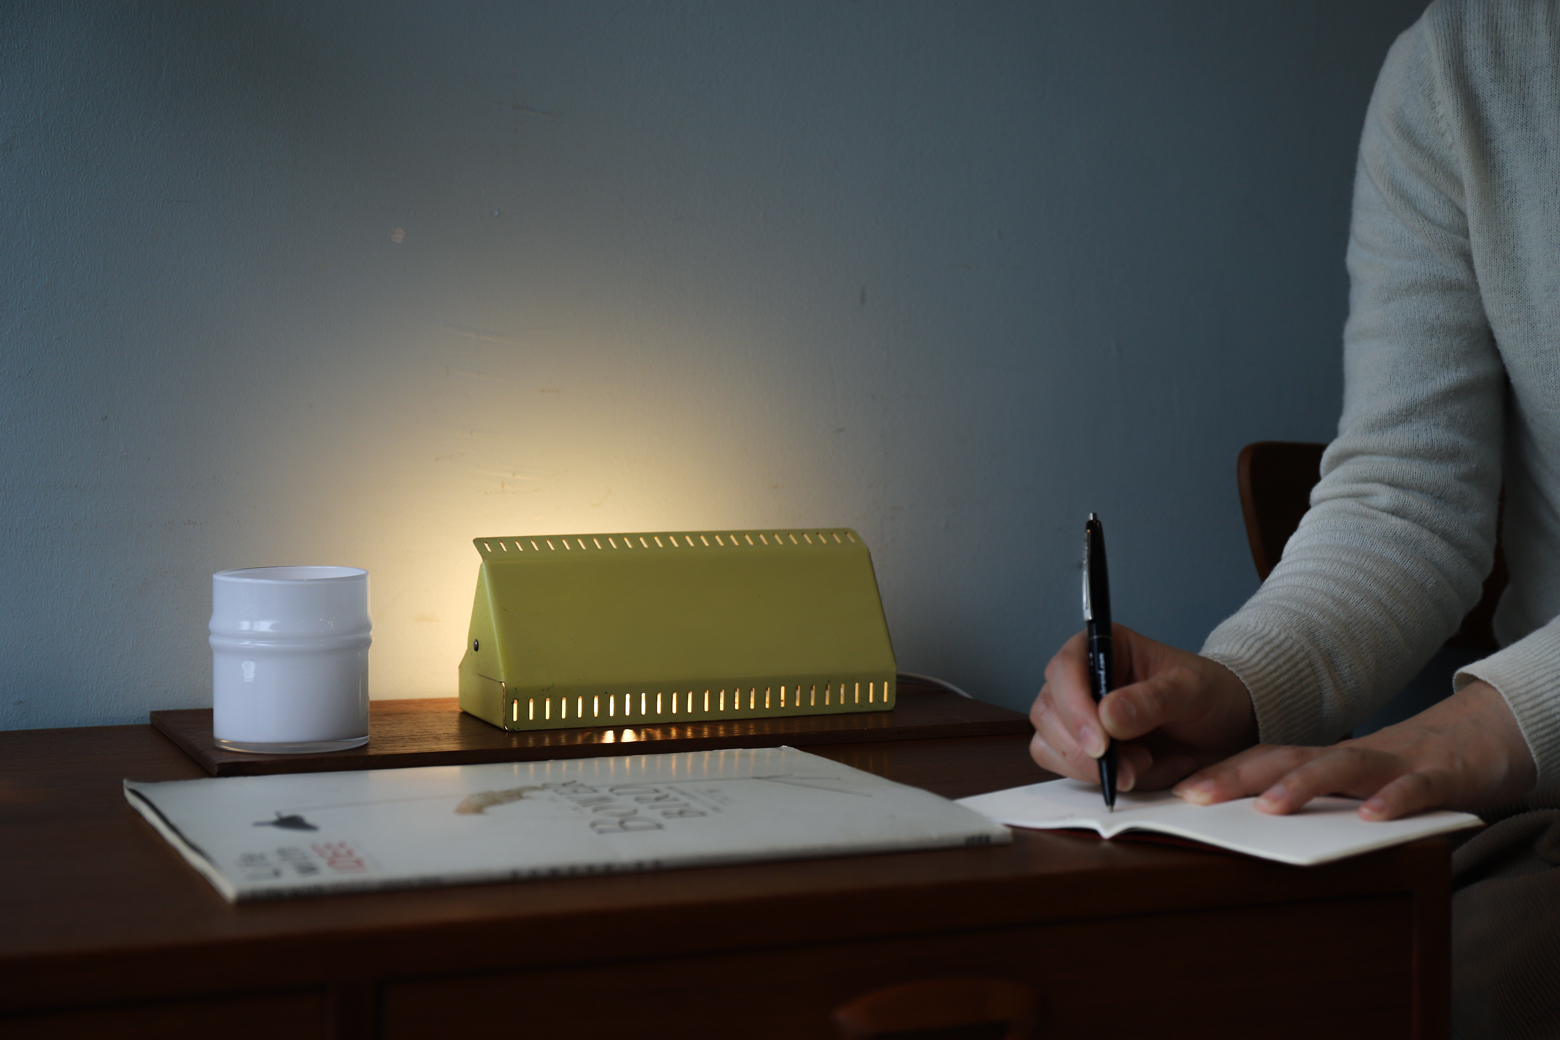 Danish Vintage Bedside Wall Lamp/デンマーク ヴィンテージ ベッドサイド ウォールランプ 照明 北欧デザイン ポストモダン